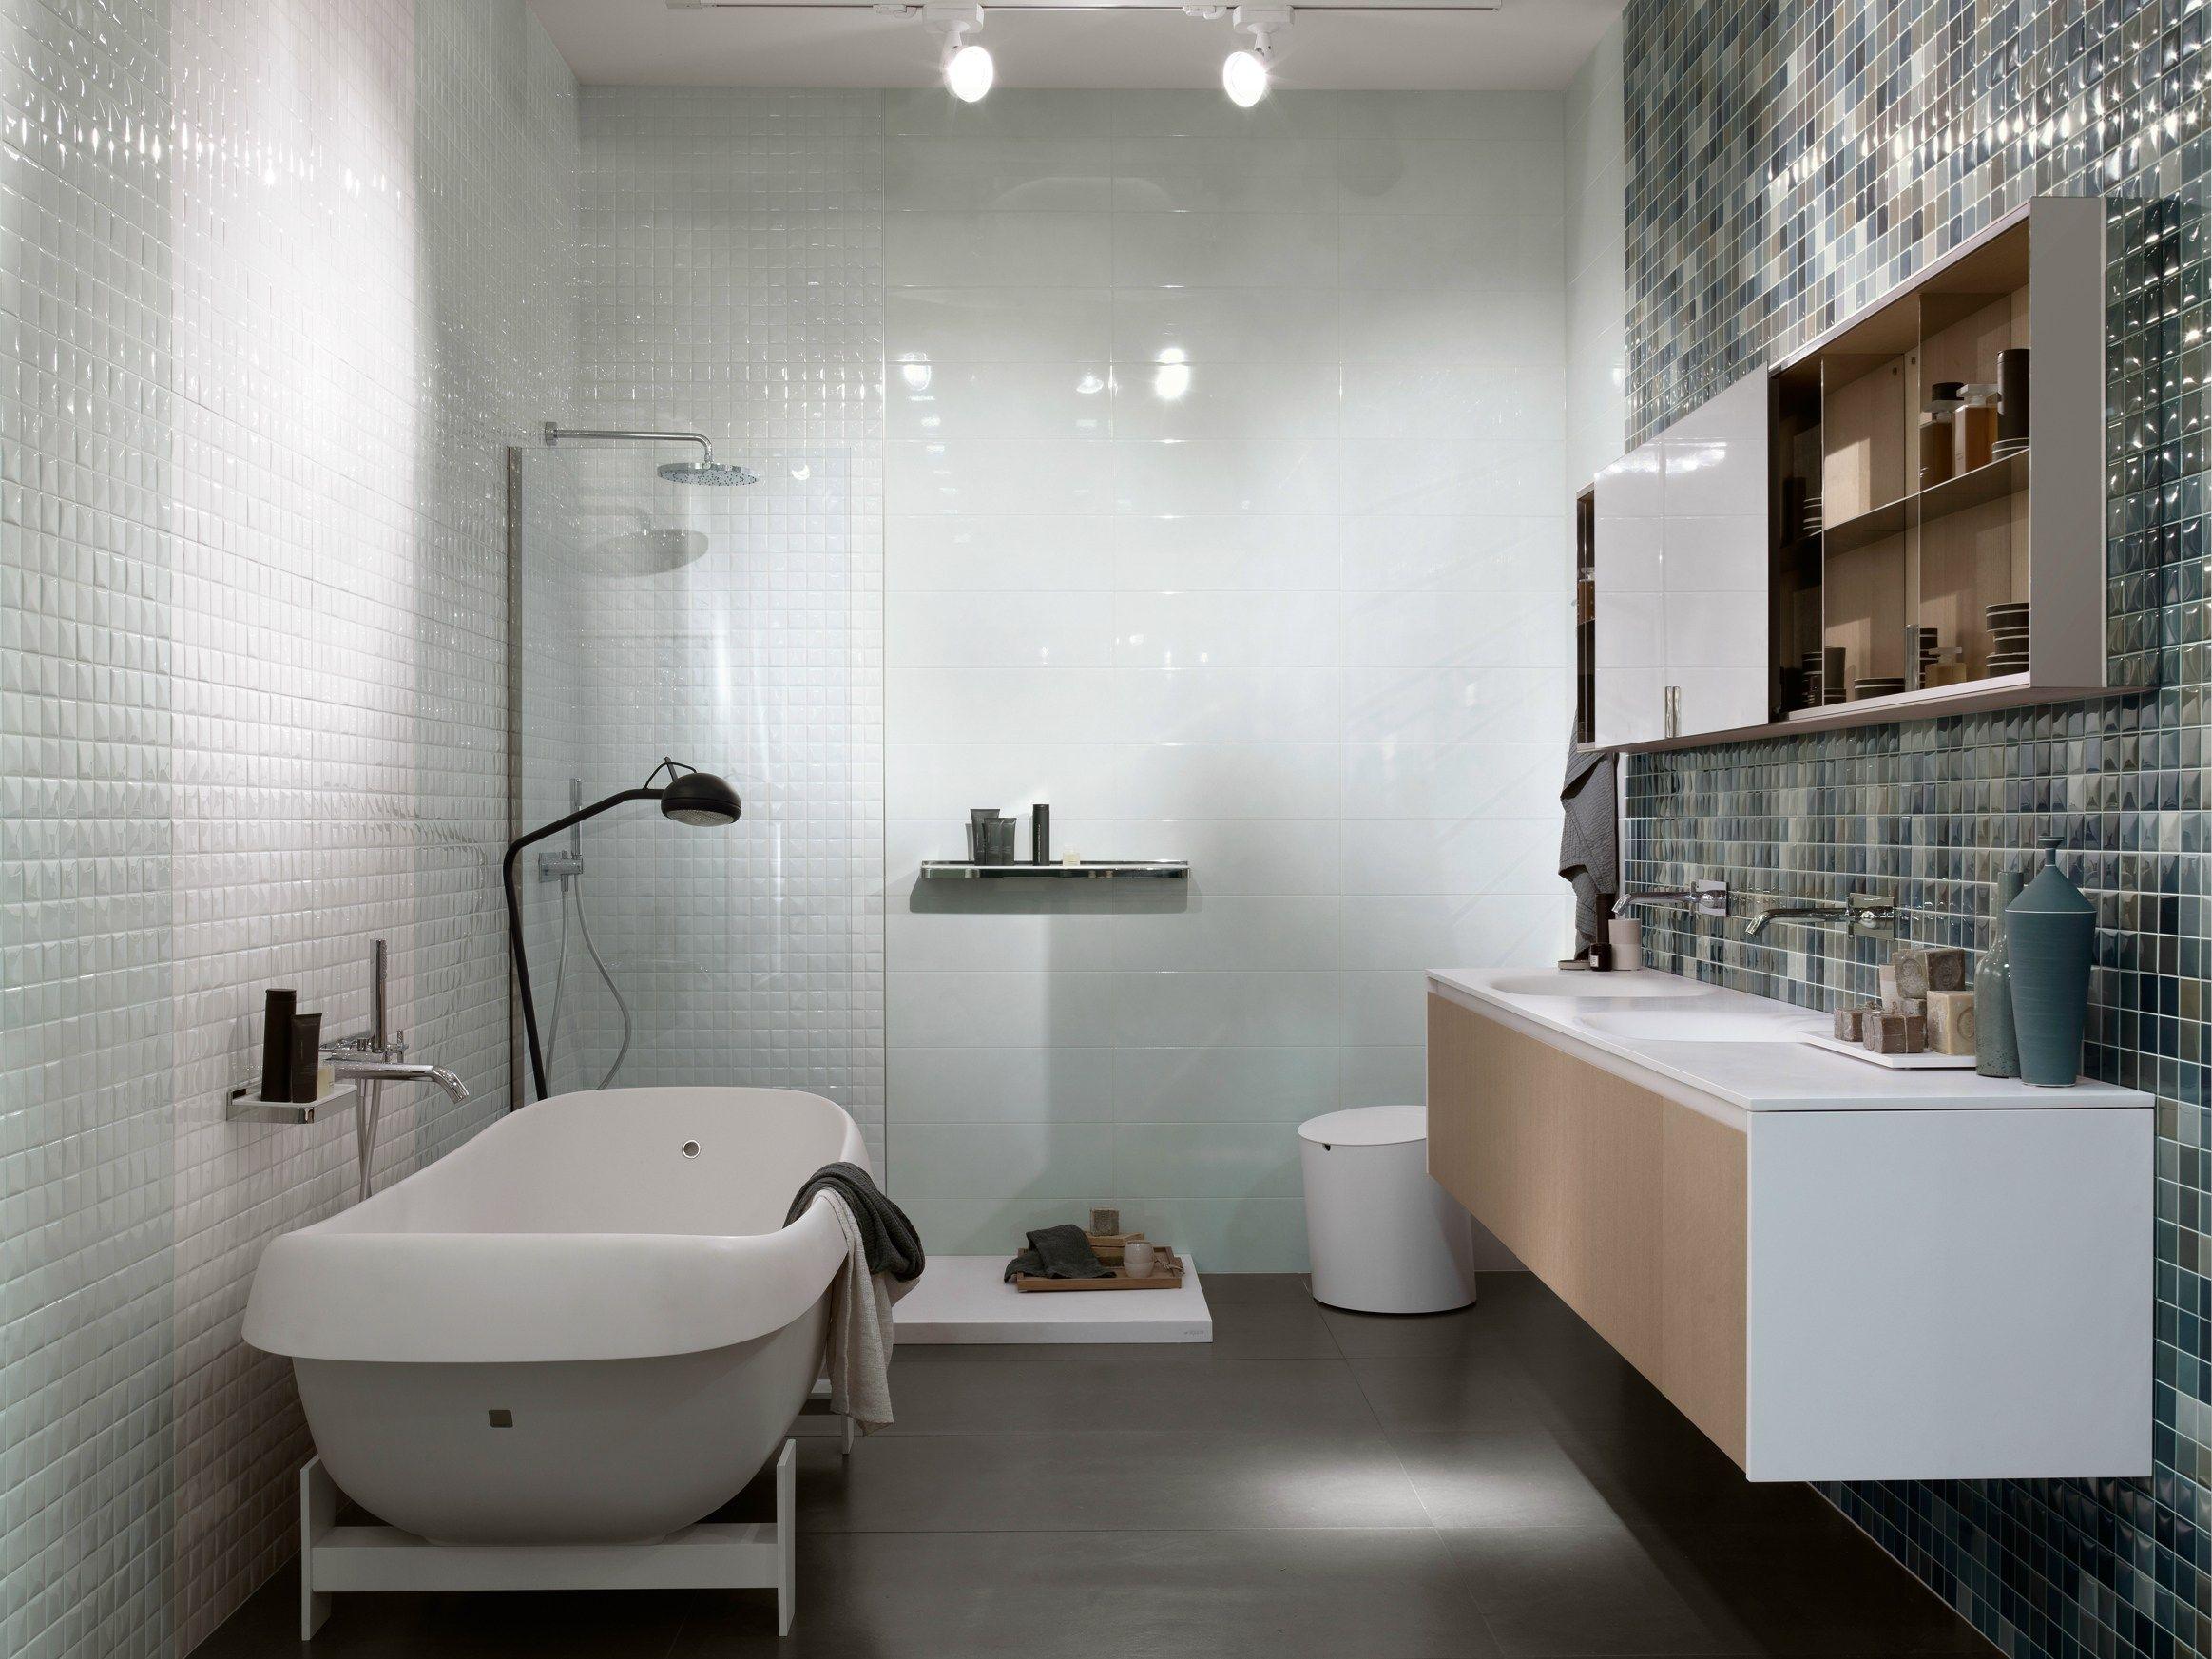 White-paste wall tiles ABITA by CERAMICA SANT'AGOSTINO